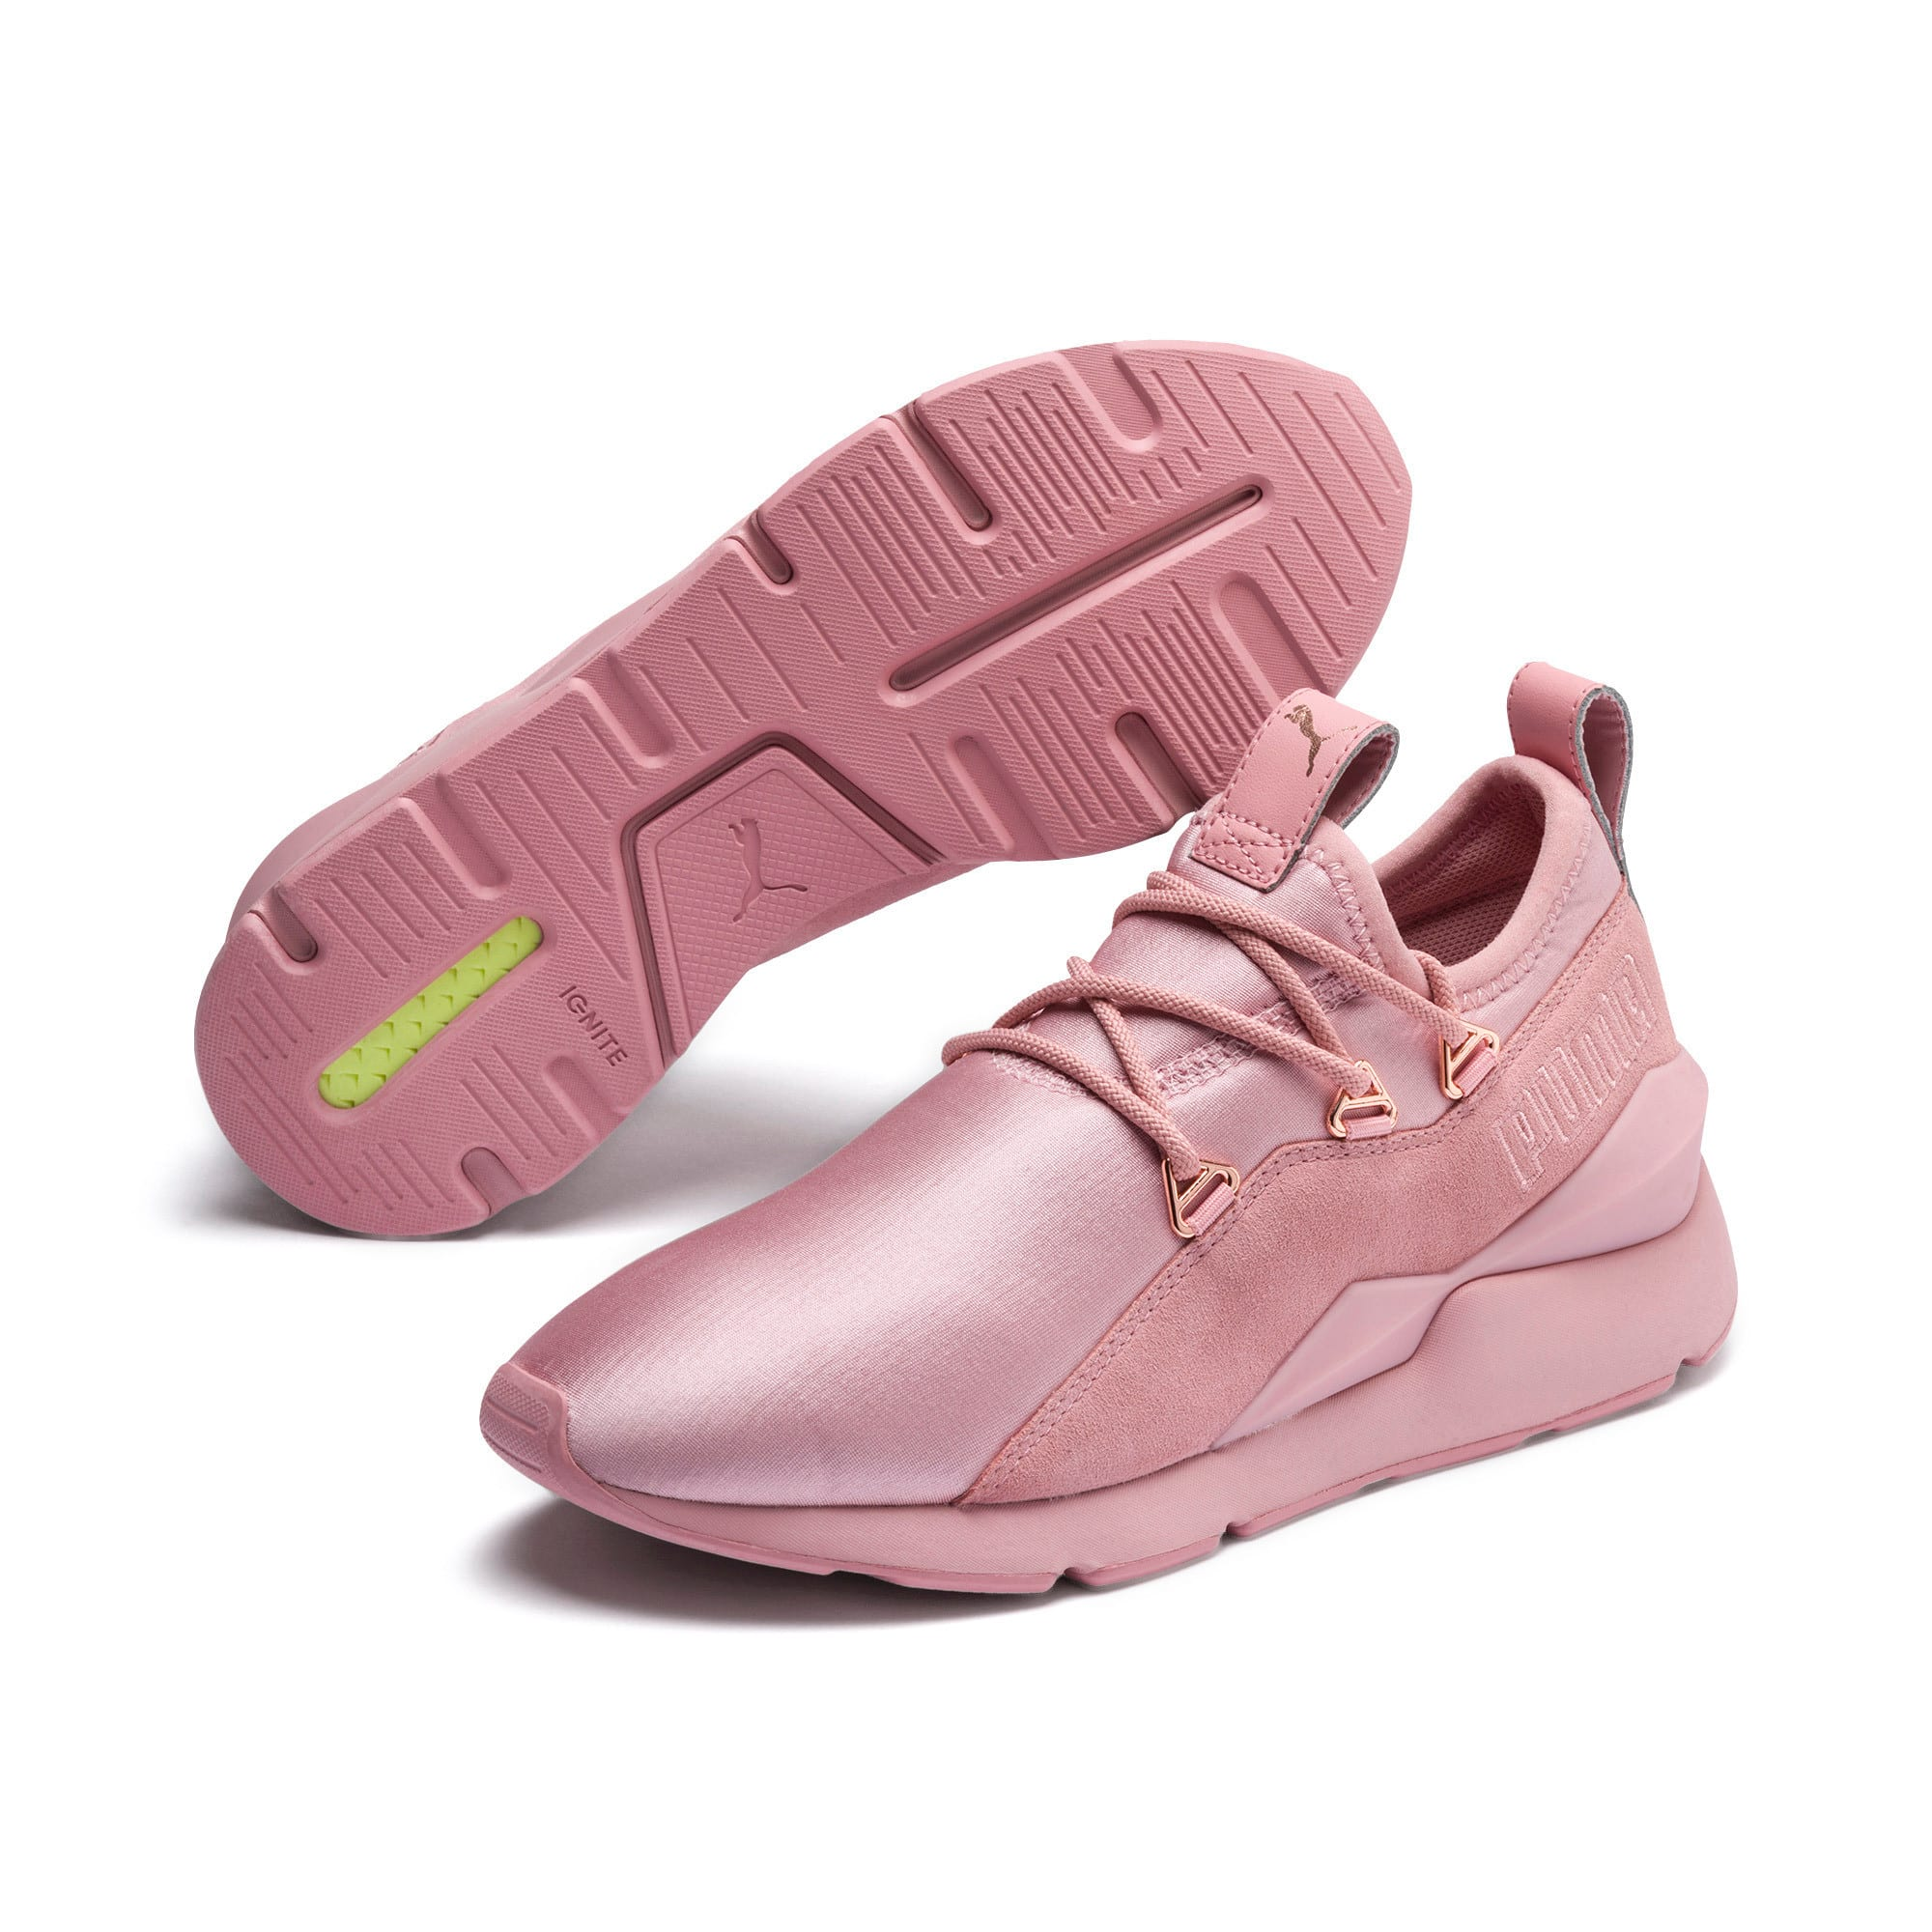 Miniatura 2 de Zapatos deportivos Muse 2 para mujer, Bridal Rose-Bridal Rose, mediano